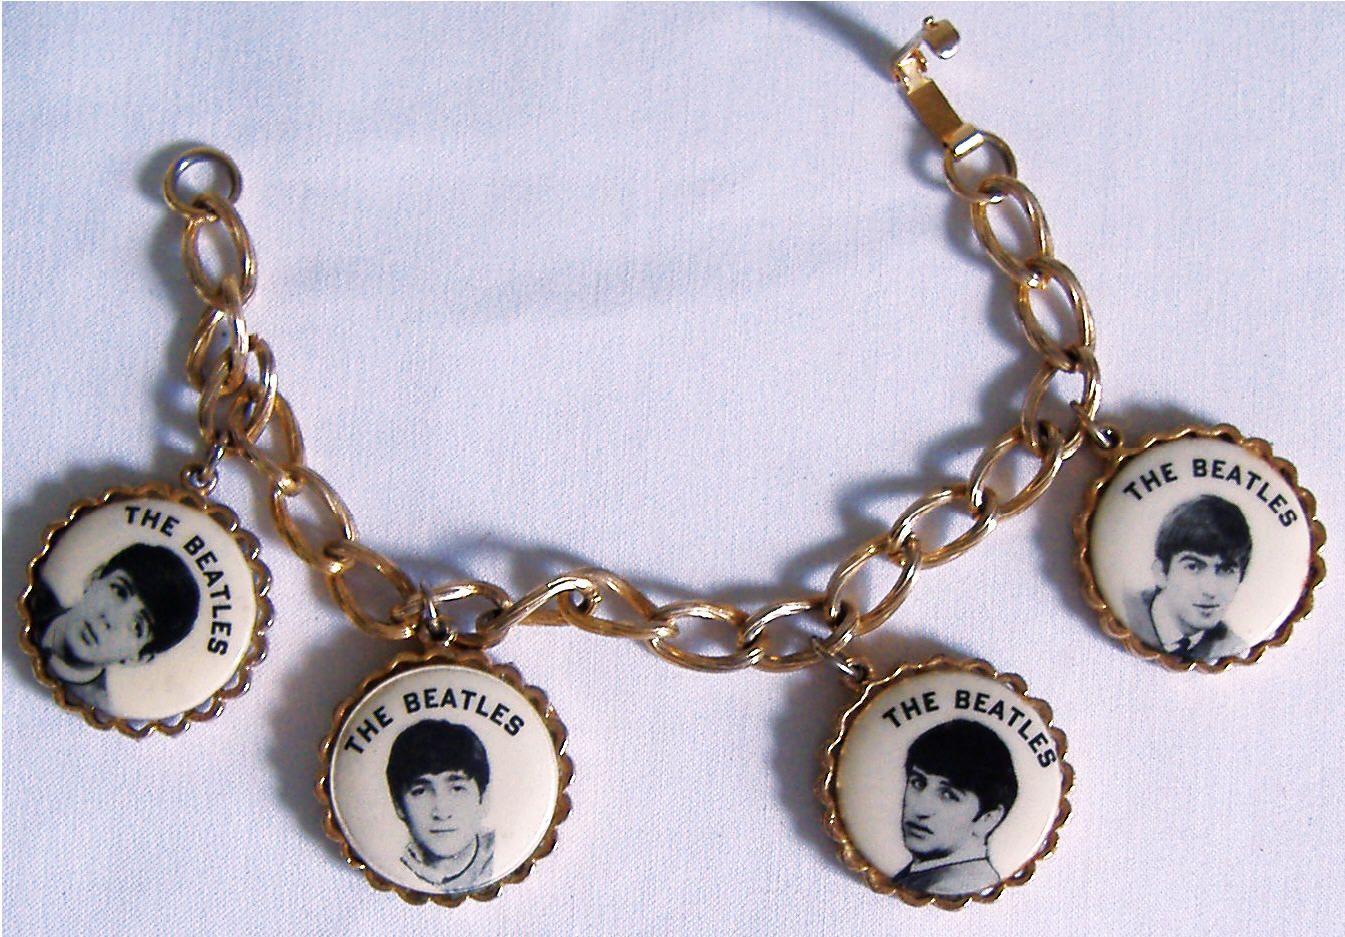 08c3fc283 The Beatles Charm Bracelet | Museum of Beatles Memorabilia & Beatles ...